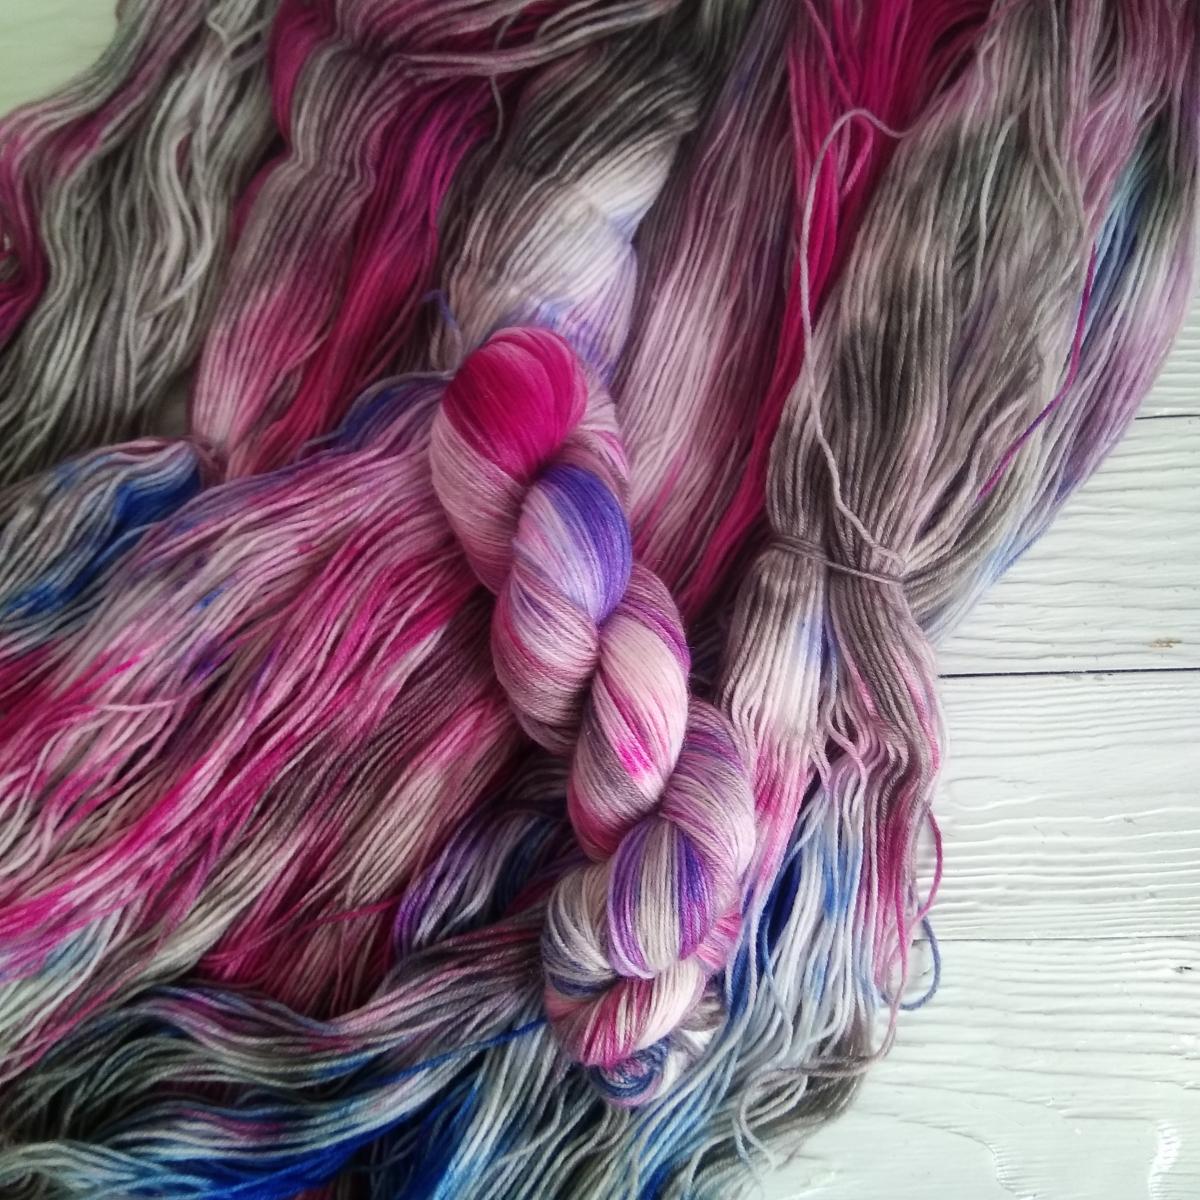 woodico.pro hand dyed yarn 034 3 1200x1200 - Hand dyed yarn / 034